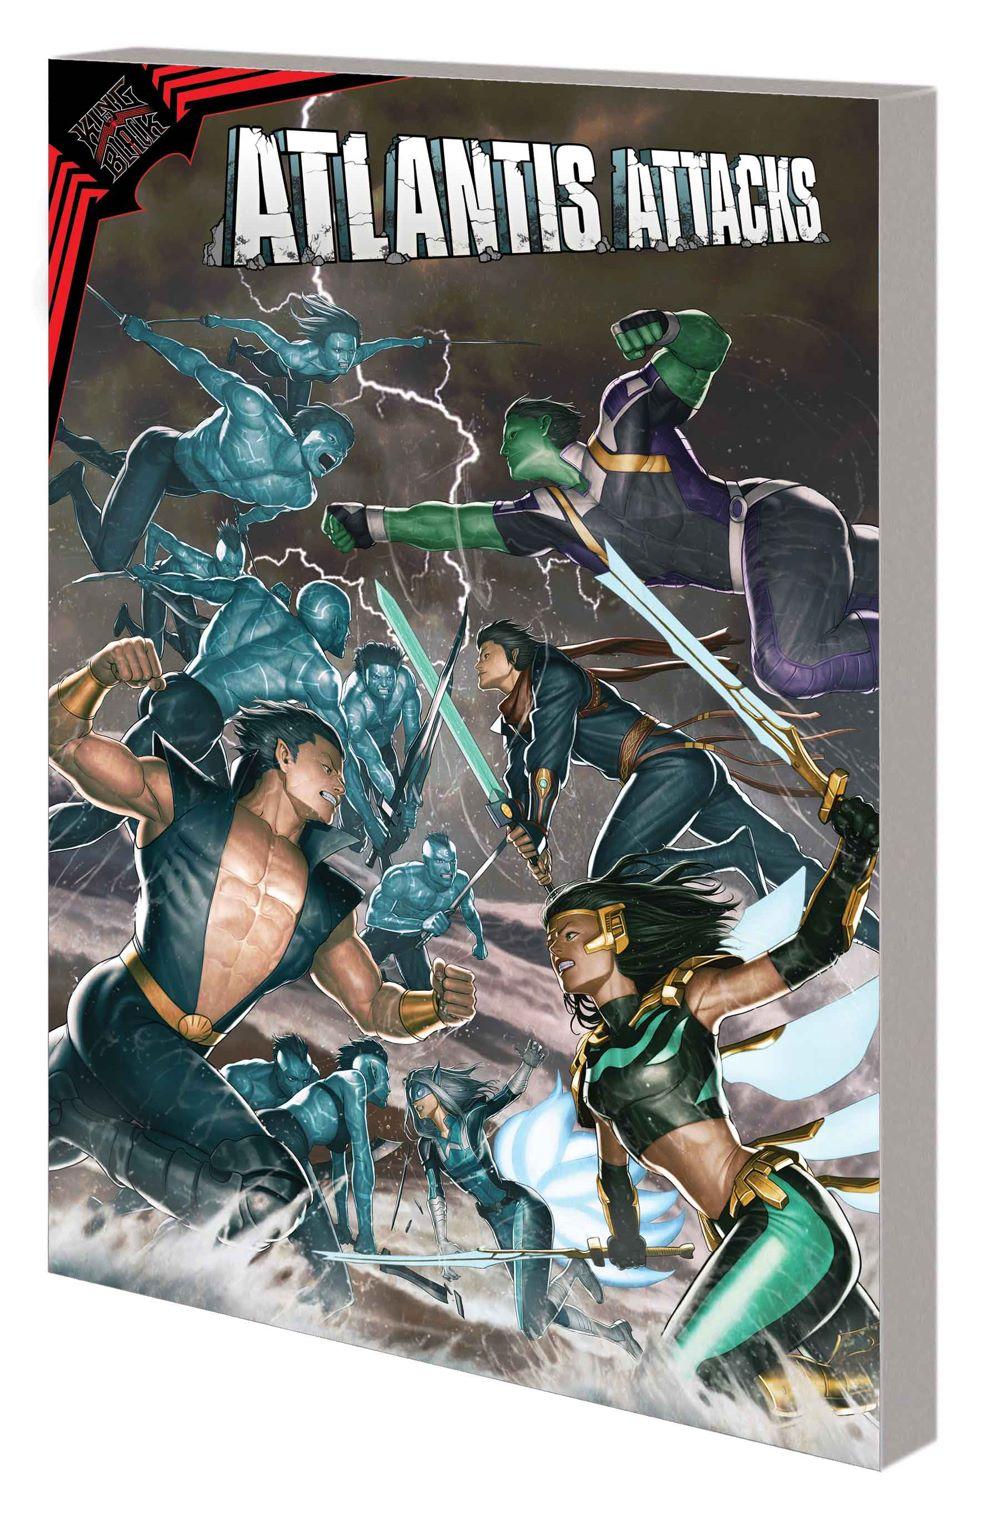 KIB_ATLANTISATTACKS_TPB Marvel Comics June 2021 Solicitations